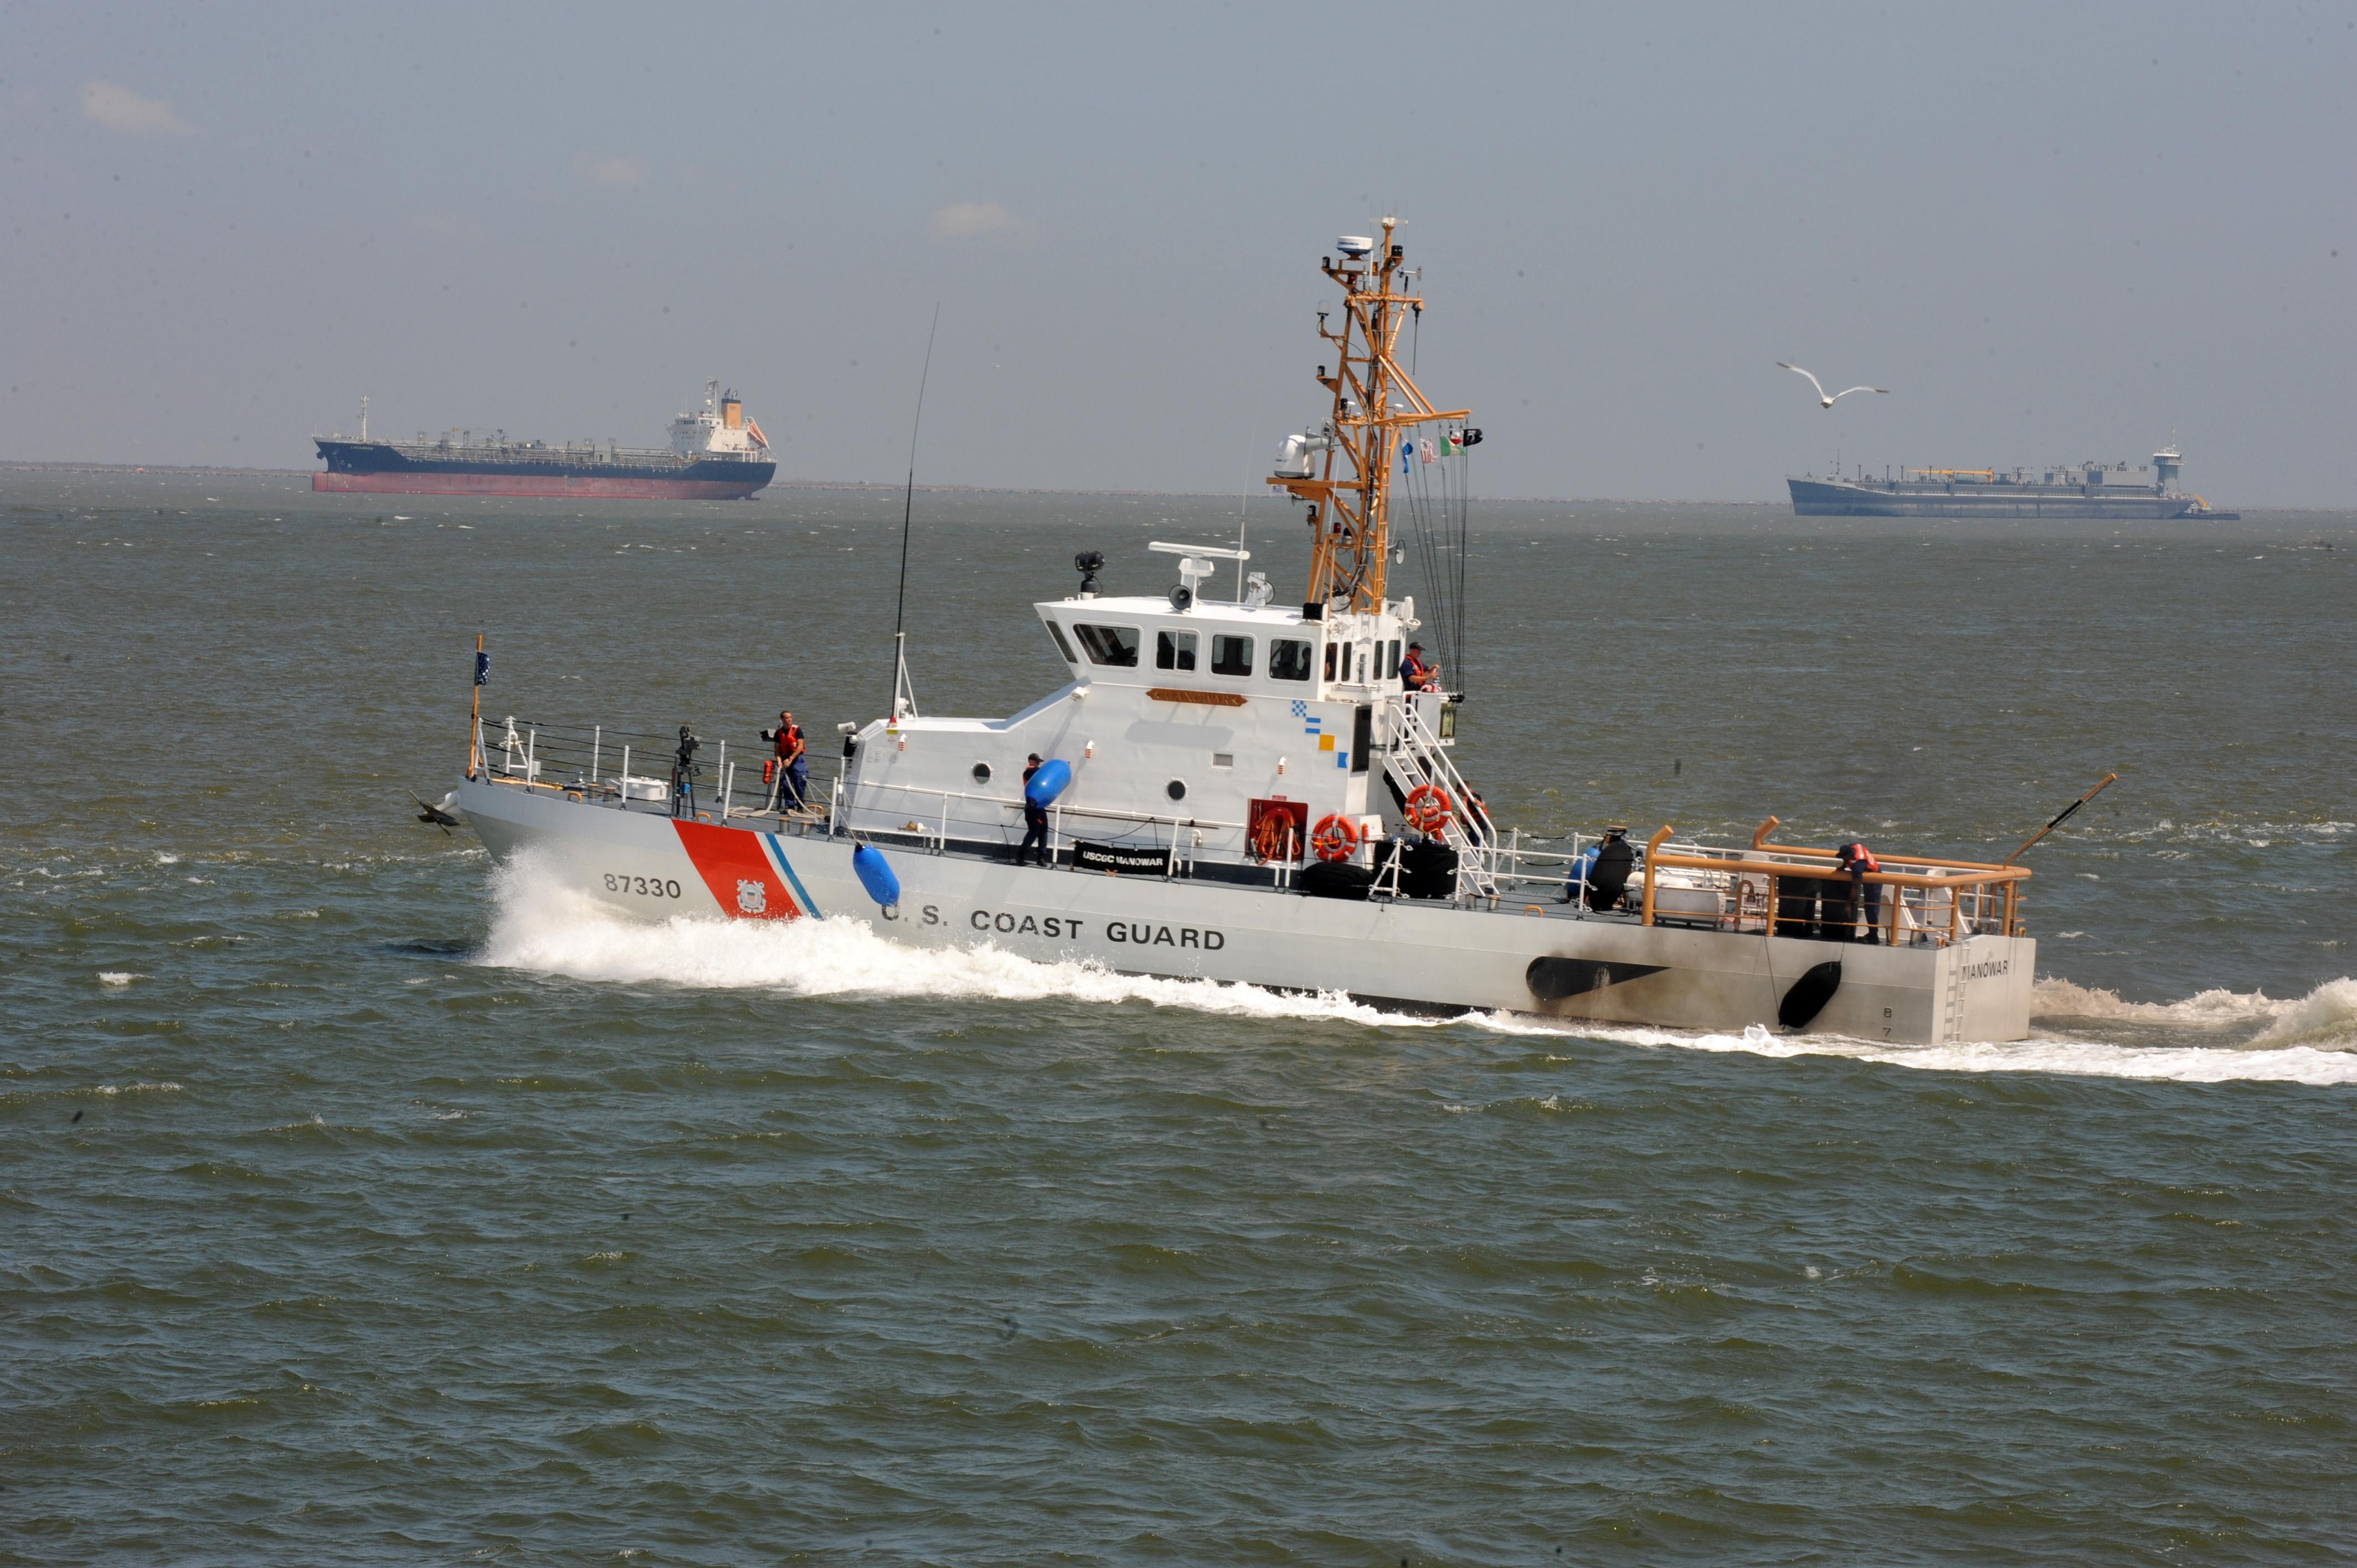 Us coast guard studies boat traffic in proposed wind farm areas